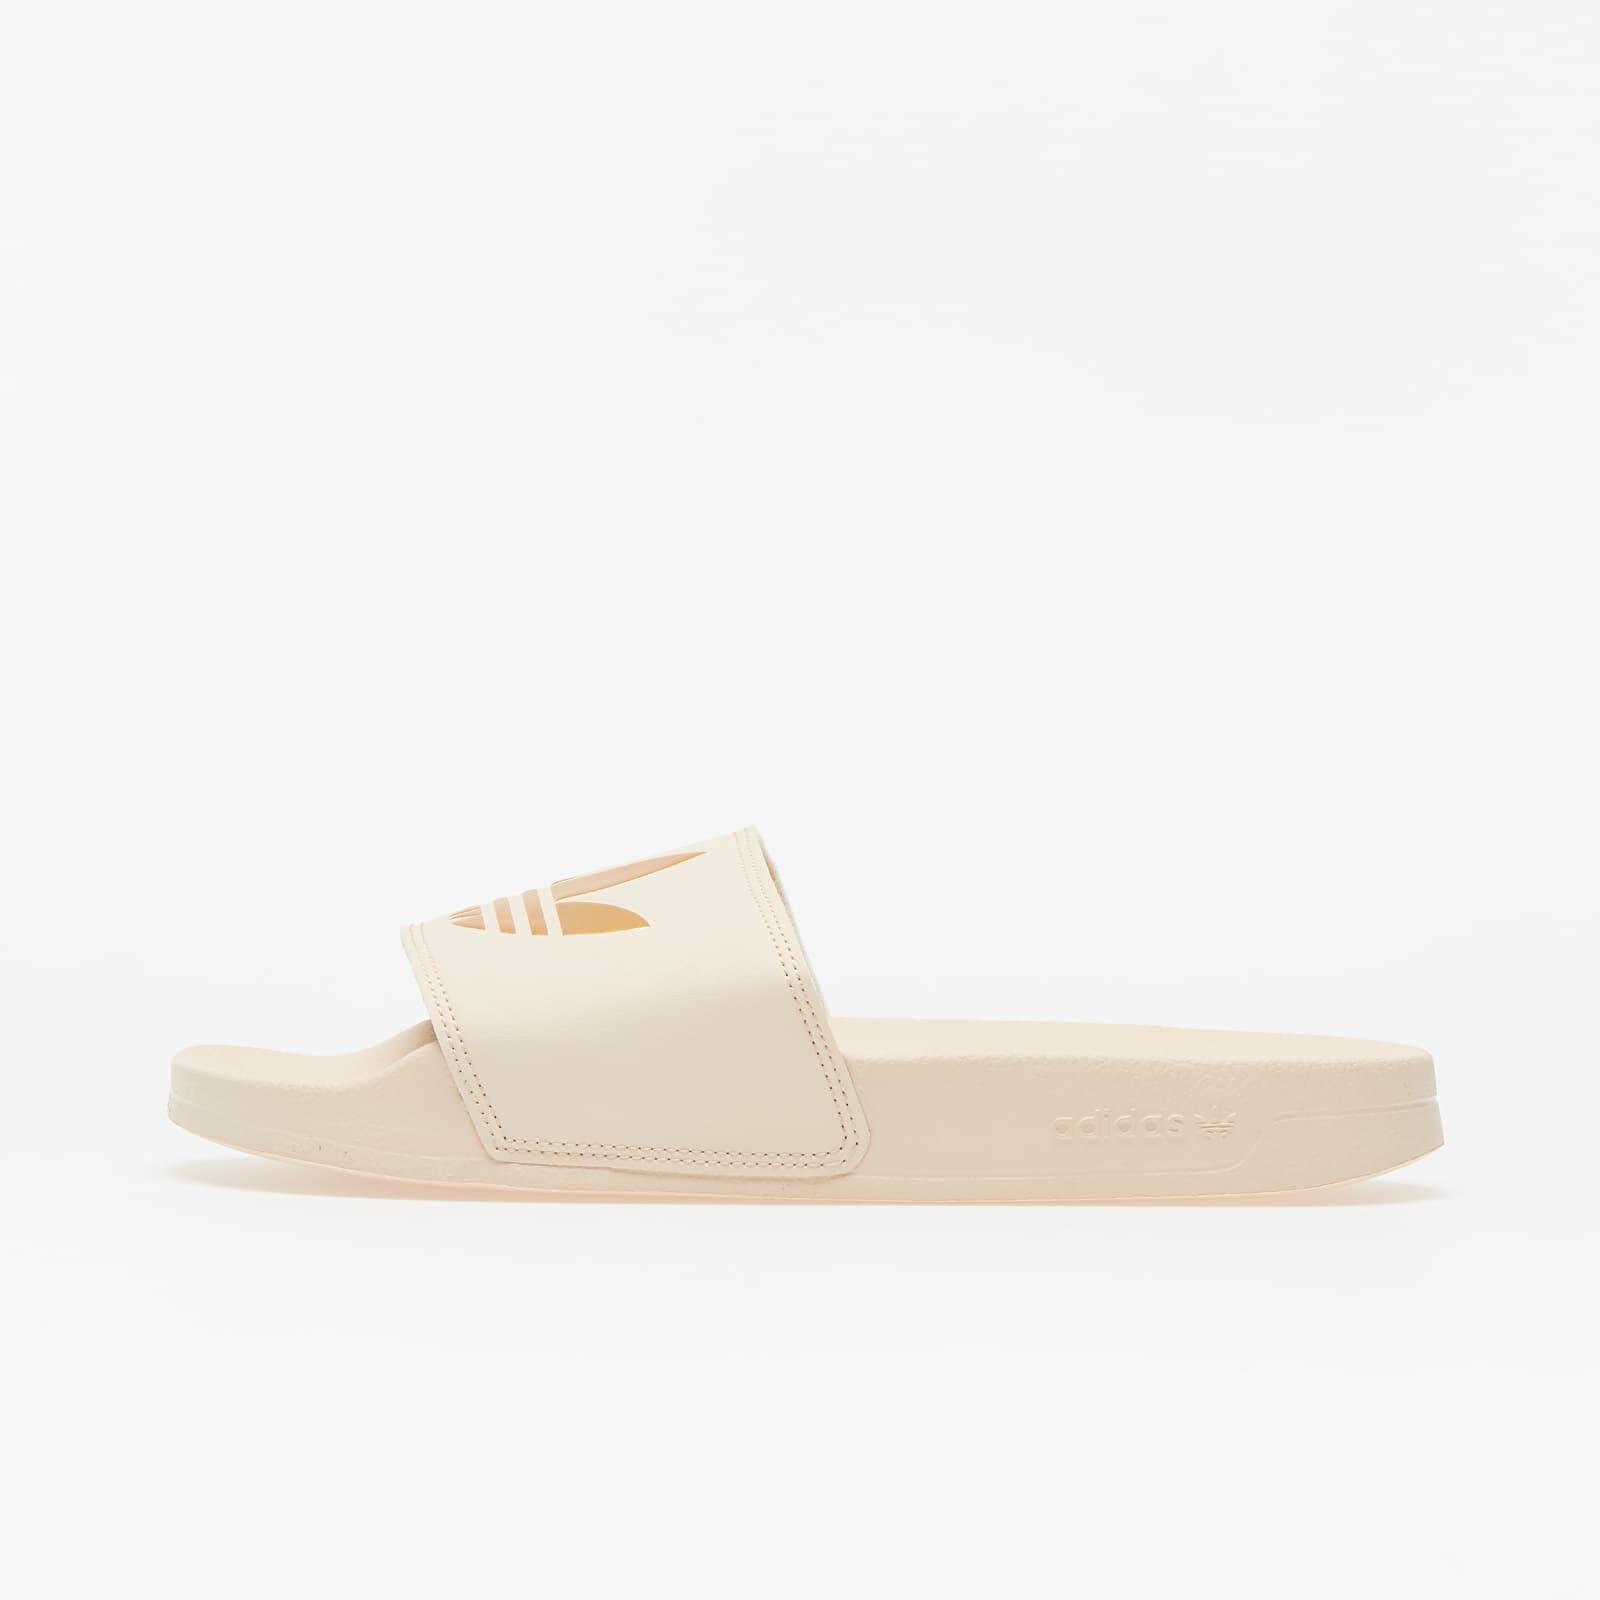 Women's shoes adidas Adilette Lite W Linen/ Gold Metalic/ Linen